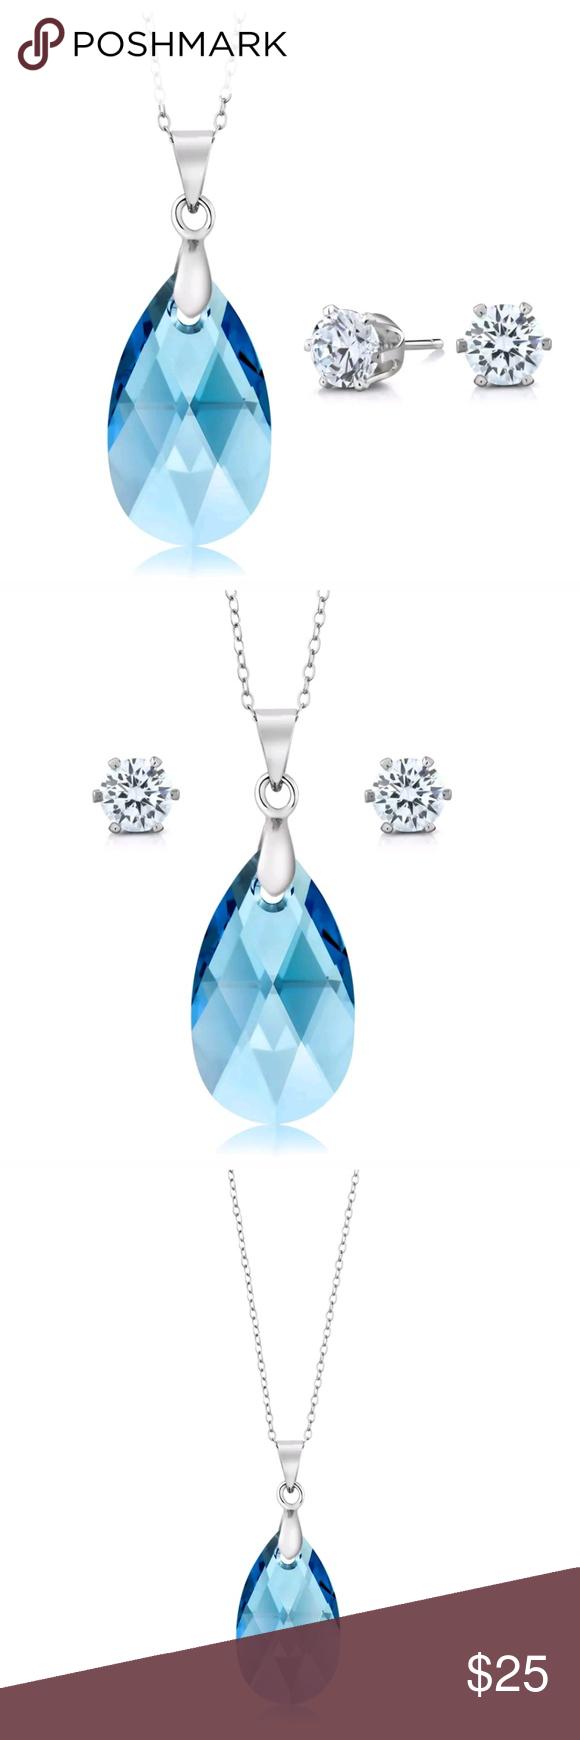 Nirano collection aqua tear drop pendant set created with swarovski